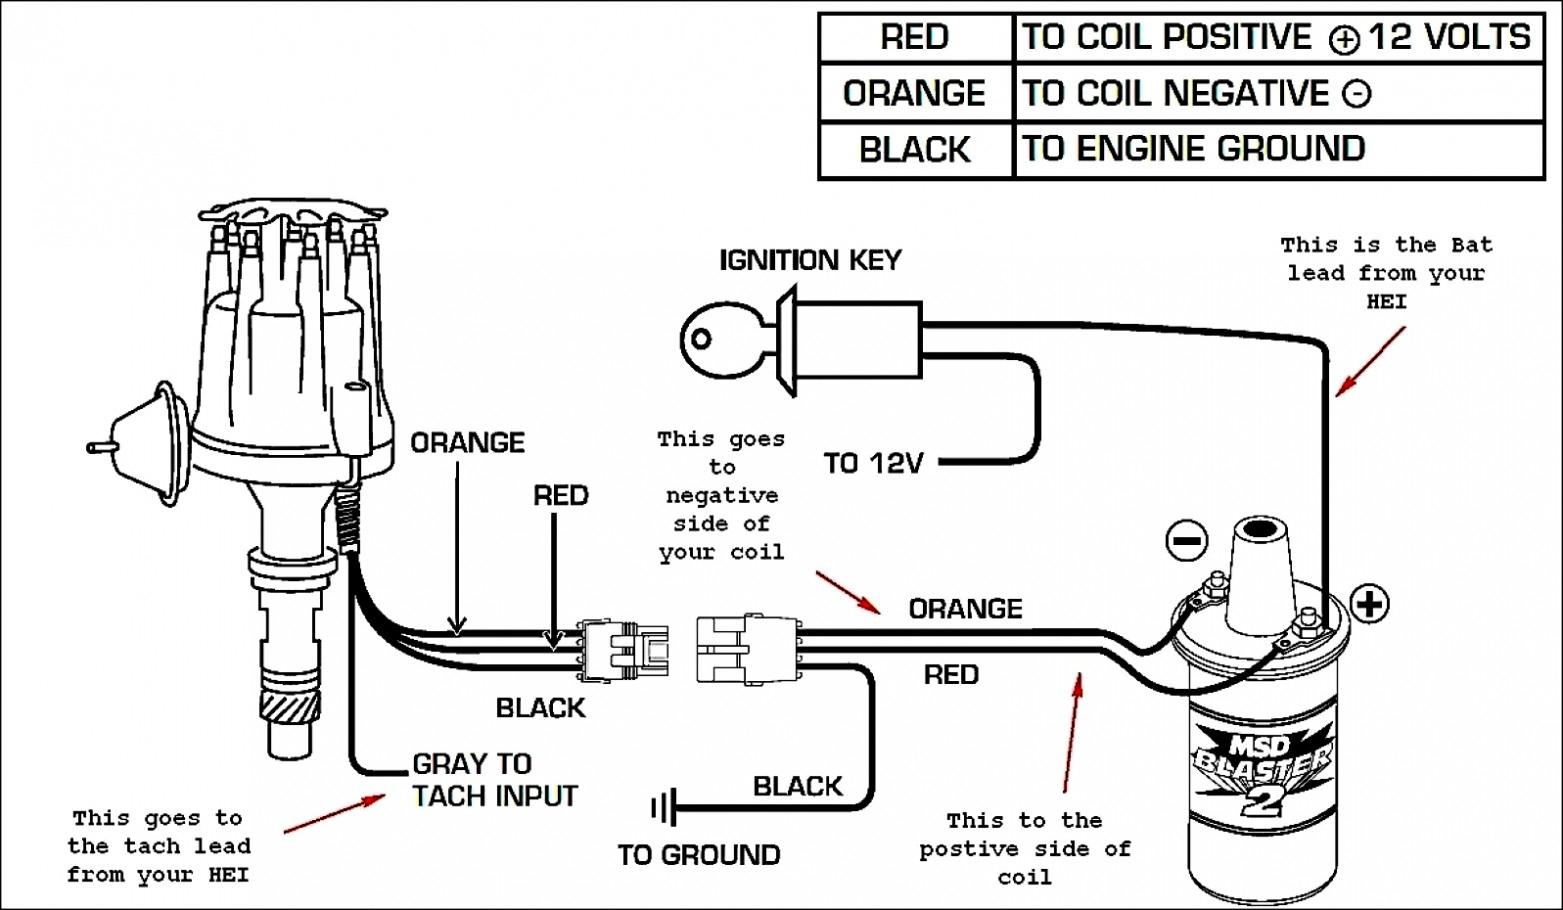 Sbc Ignition Starter Alternator Wiring | Wiring Diagram - Alternator Wiring Diagram Chevy 350